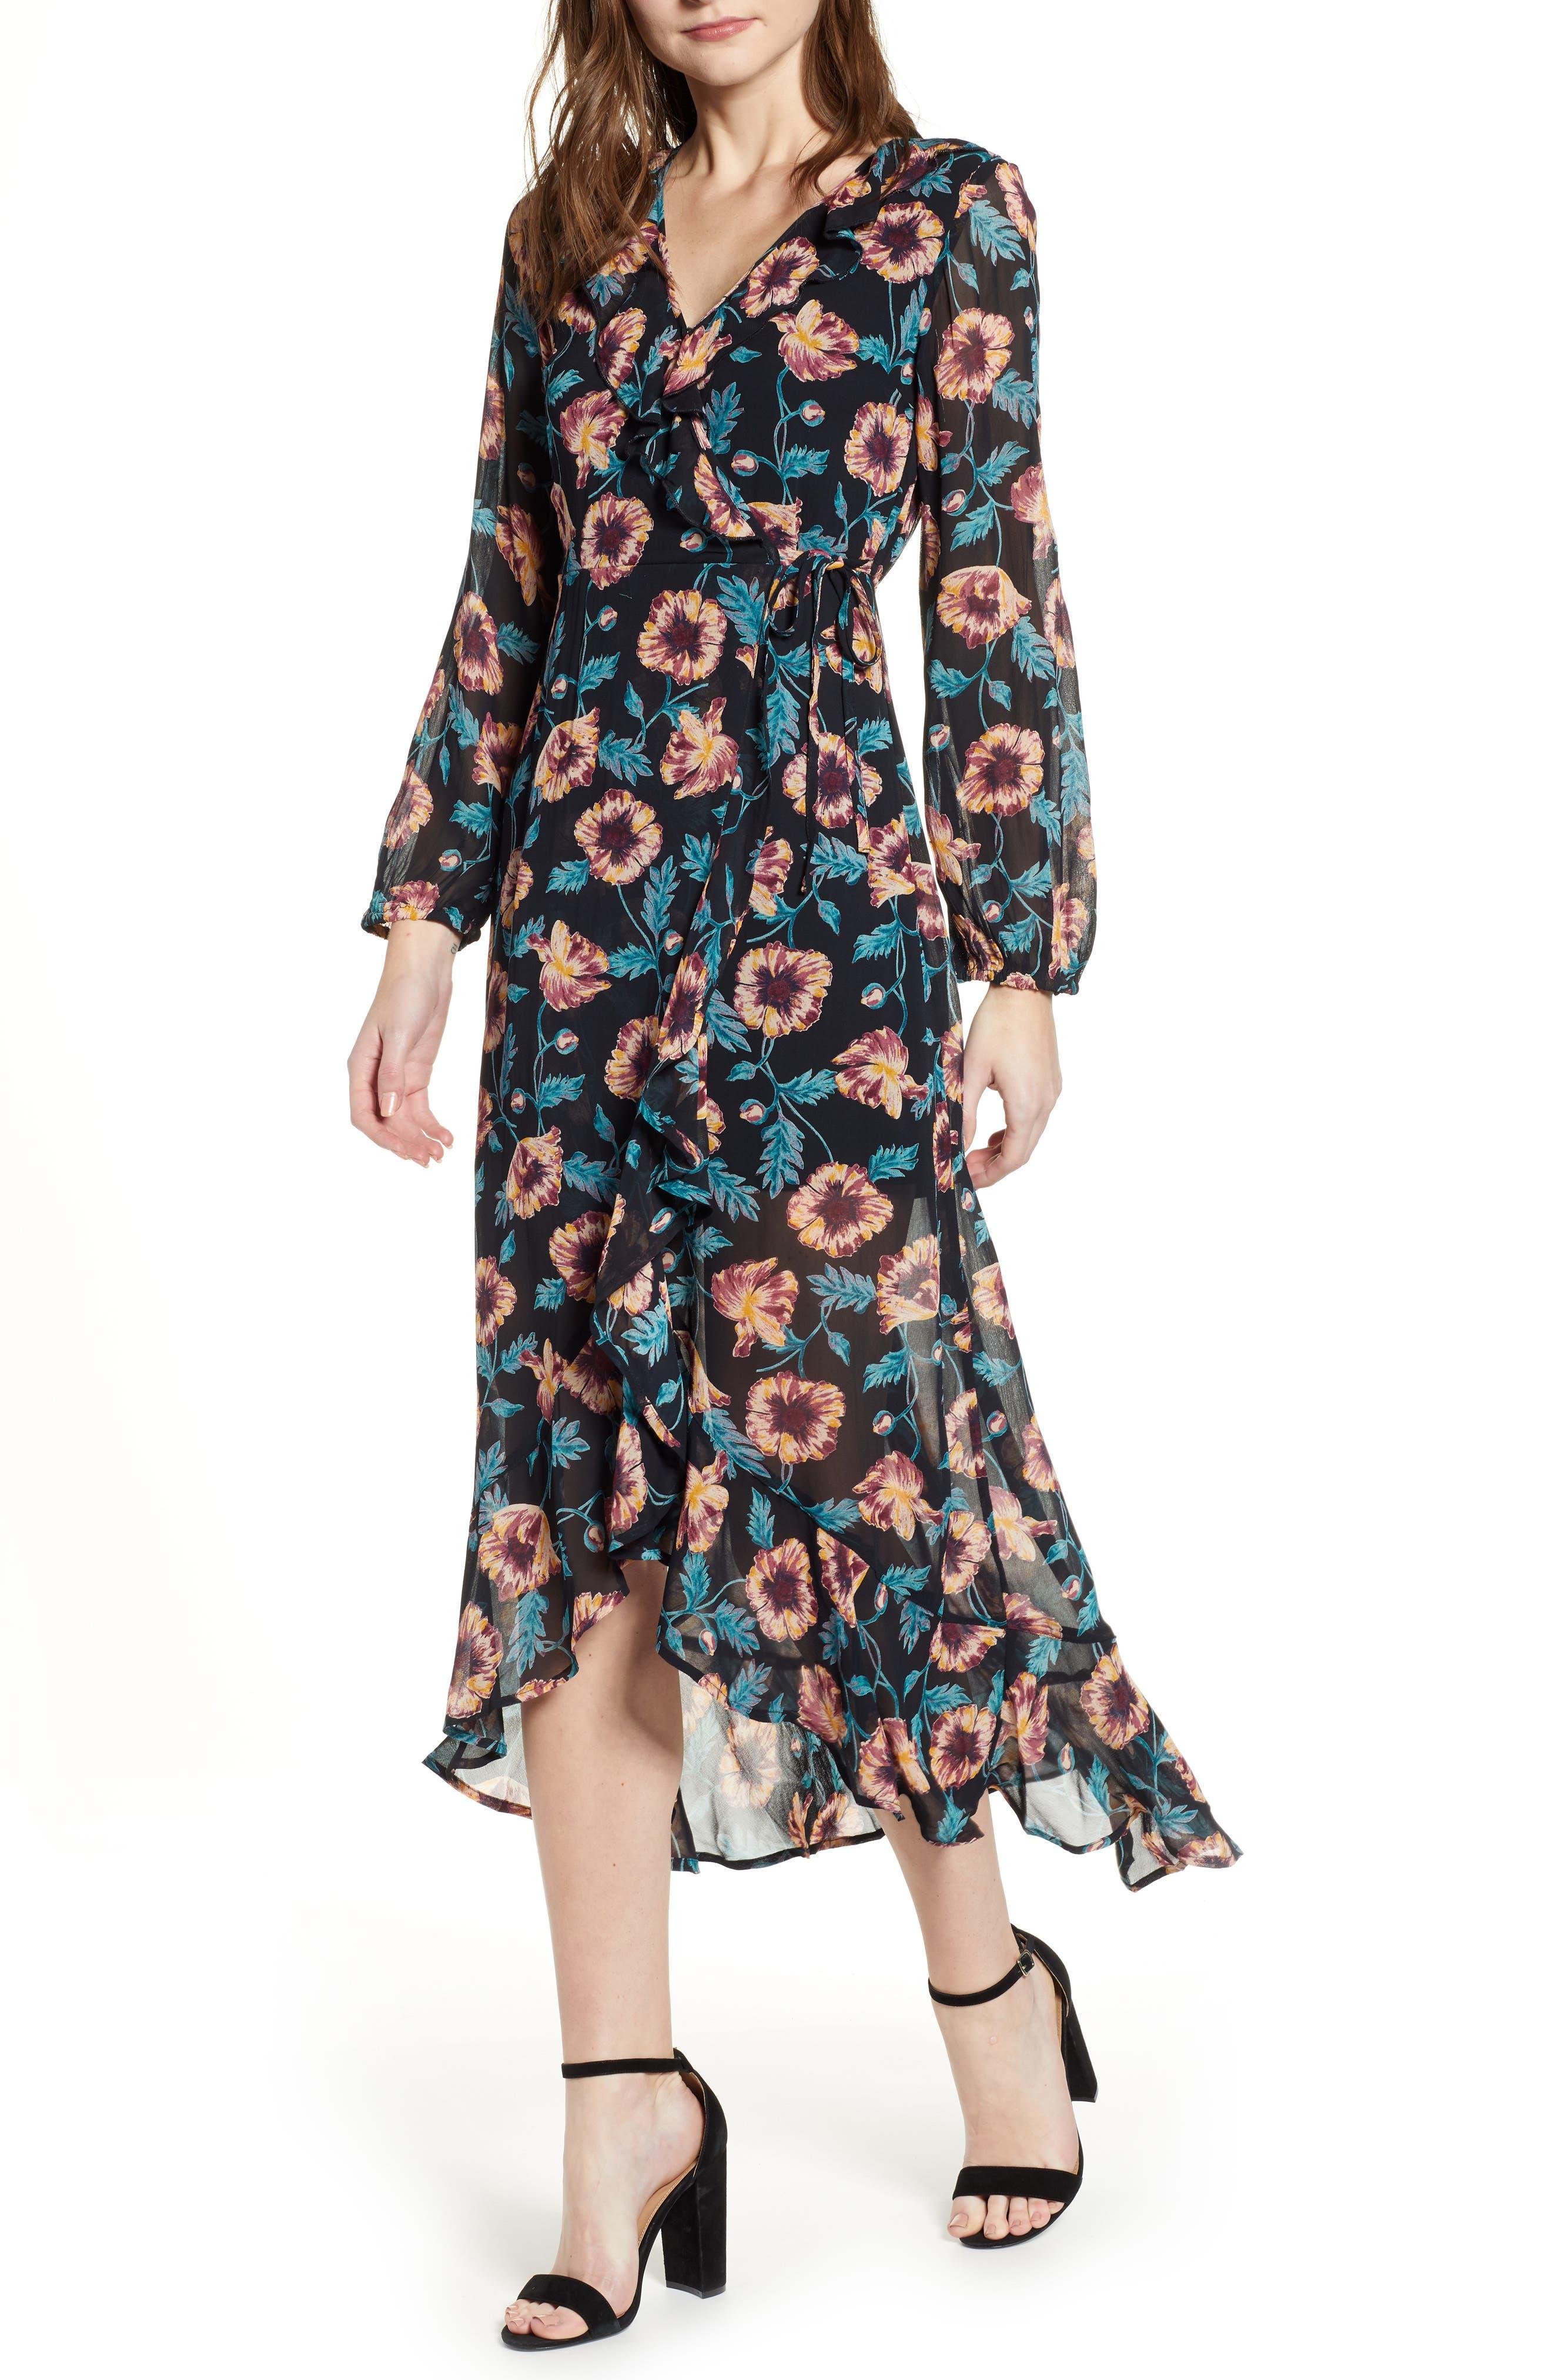 BAND OF GYPSIES Reese Floral Print Midi Dress in Black/ Crimson